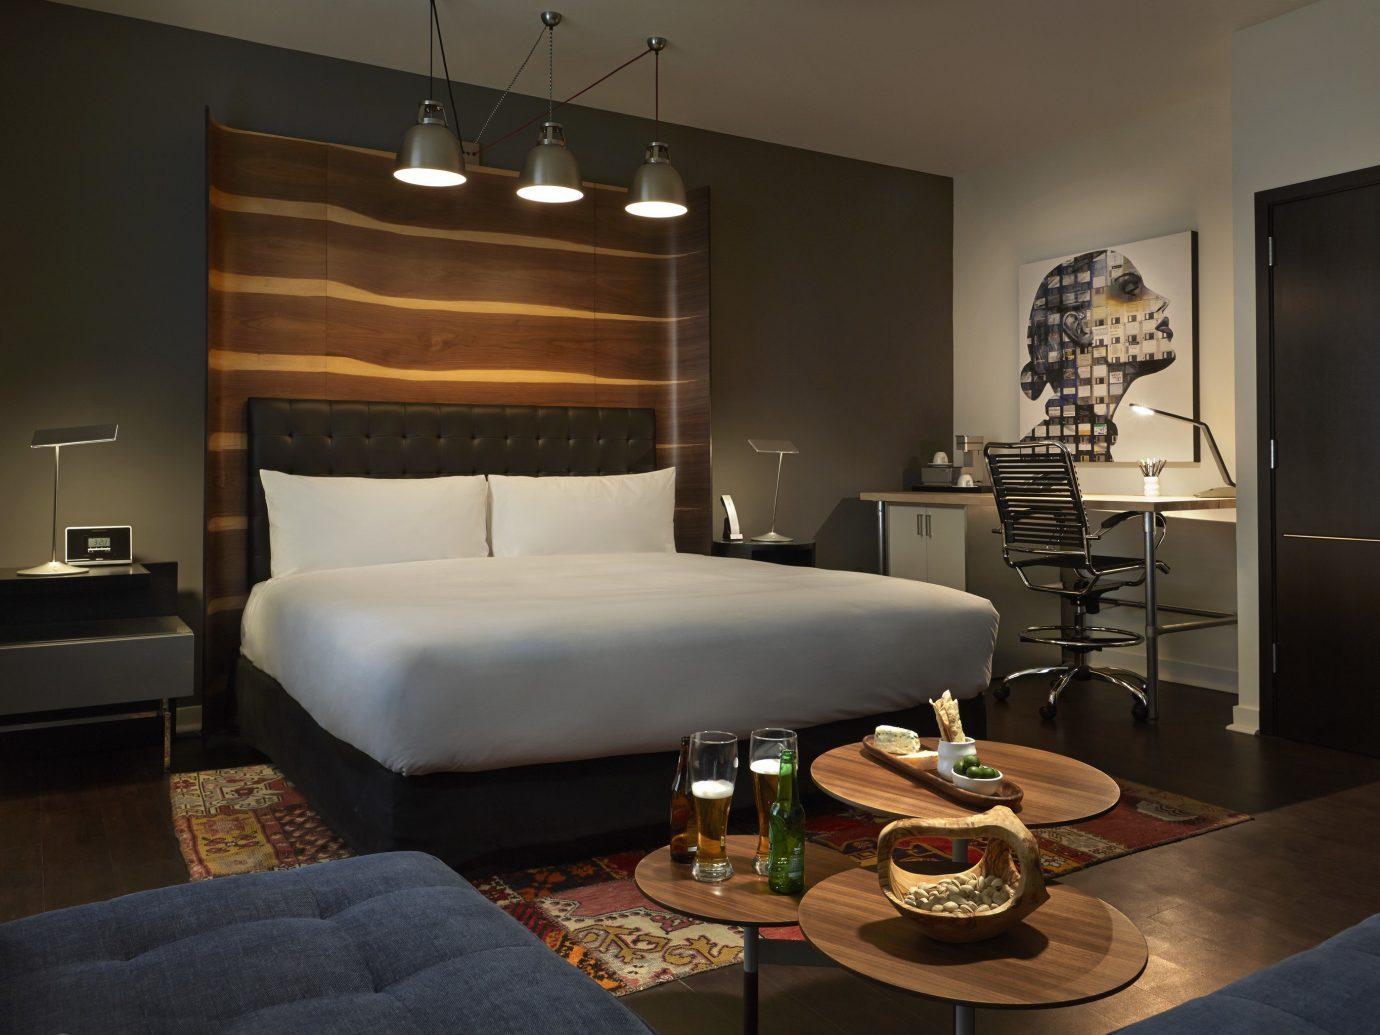 Hotels wall indoor room floor property living room interior design Suite estate home condominium Bedroom hotel real estate Design cottage apartment furniture